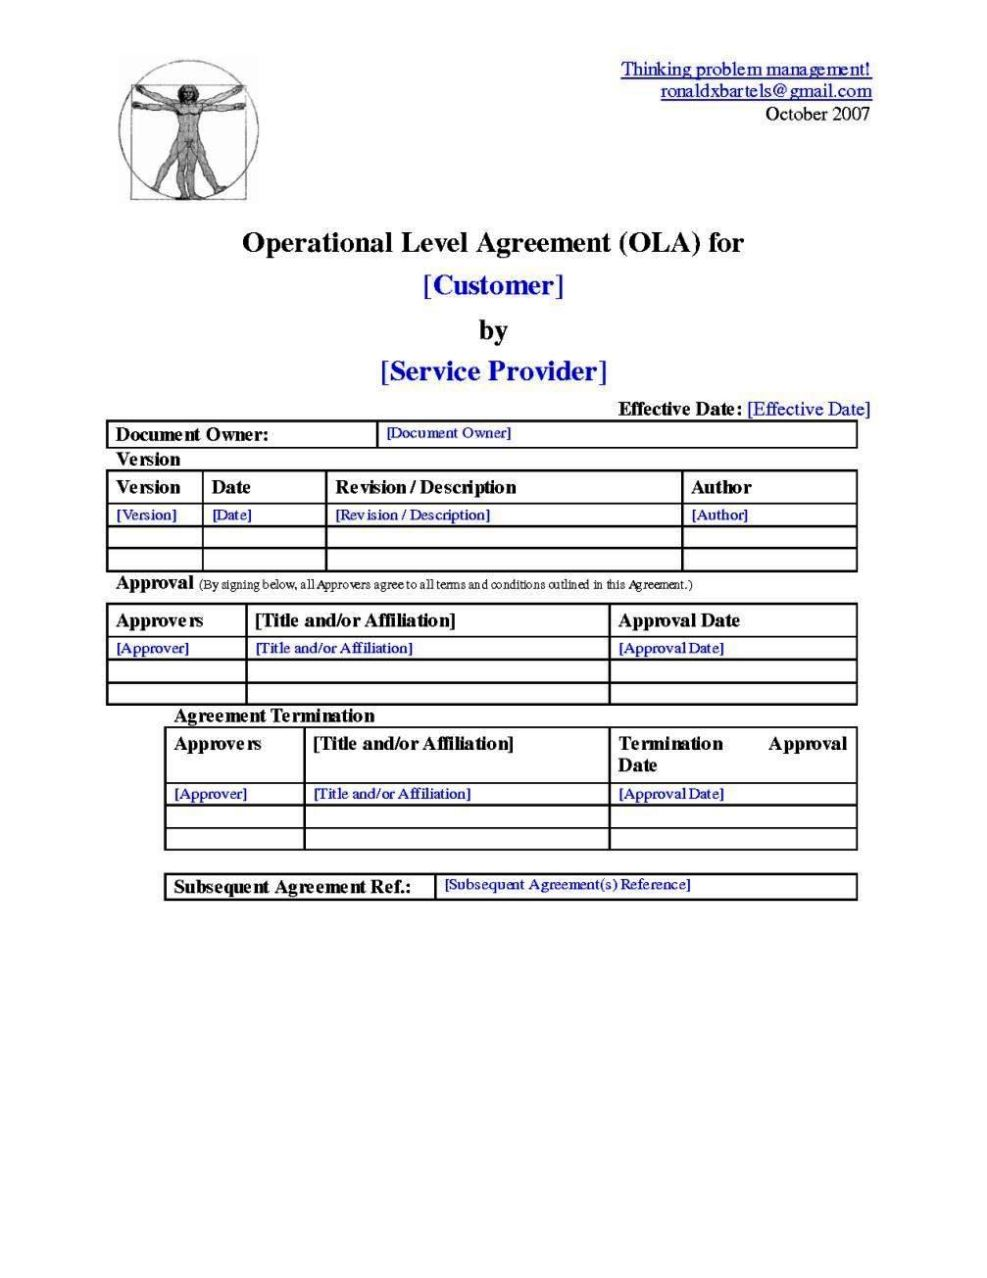 Operating Level Agreement Template SampleTemplatess